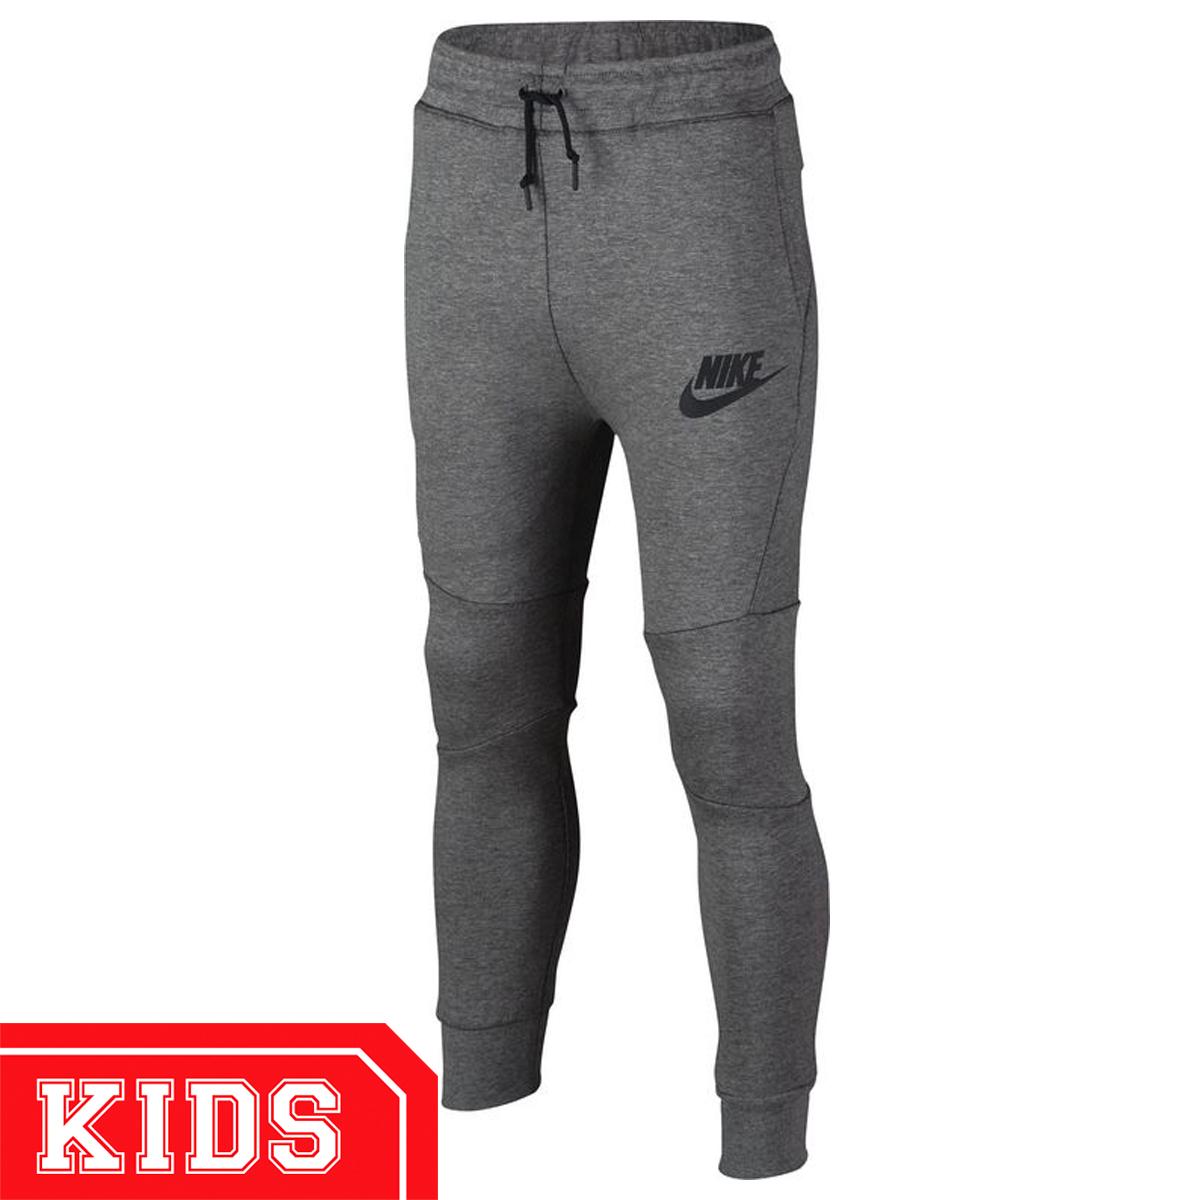 f030d879677f Nike 804818 (KIDS) TECH FLEECE PANT JUNIOR